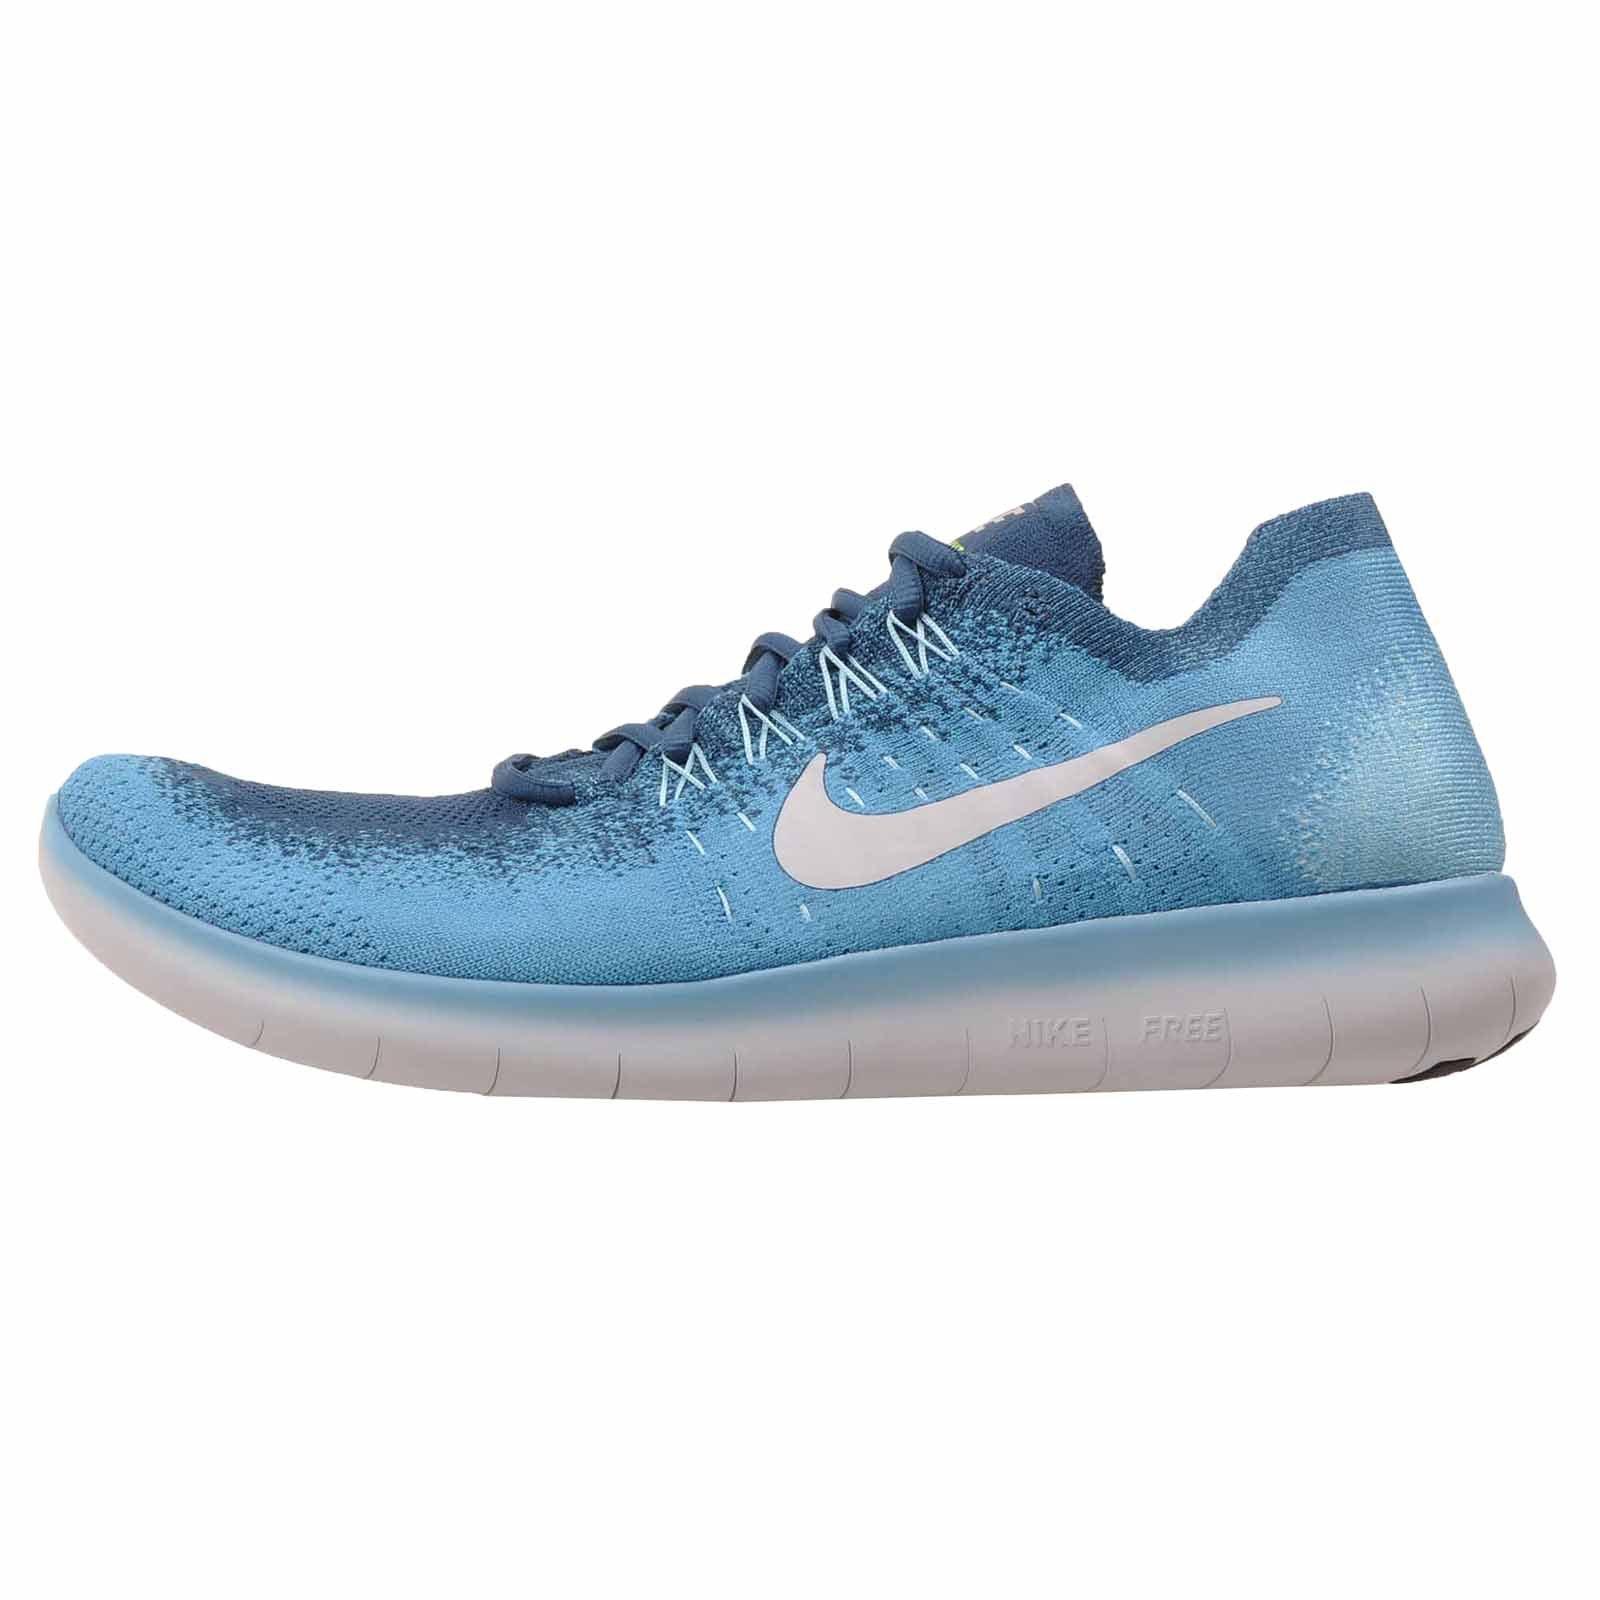 Nike Free Rn Flyknit 2017 Sz 11 Mens Running Blue Lagoon/Pure Platinum-Legend Blue Shoes